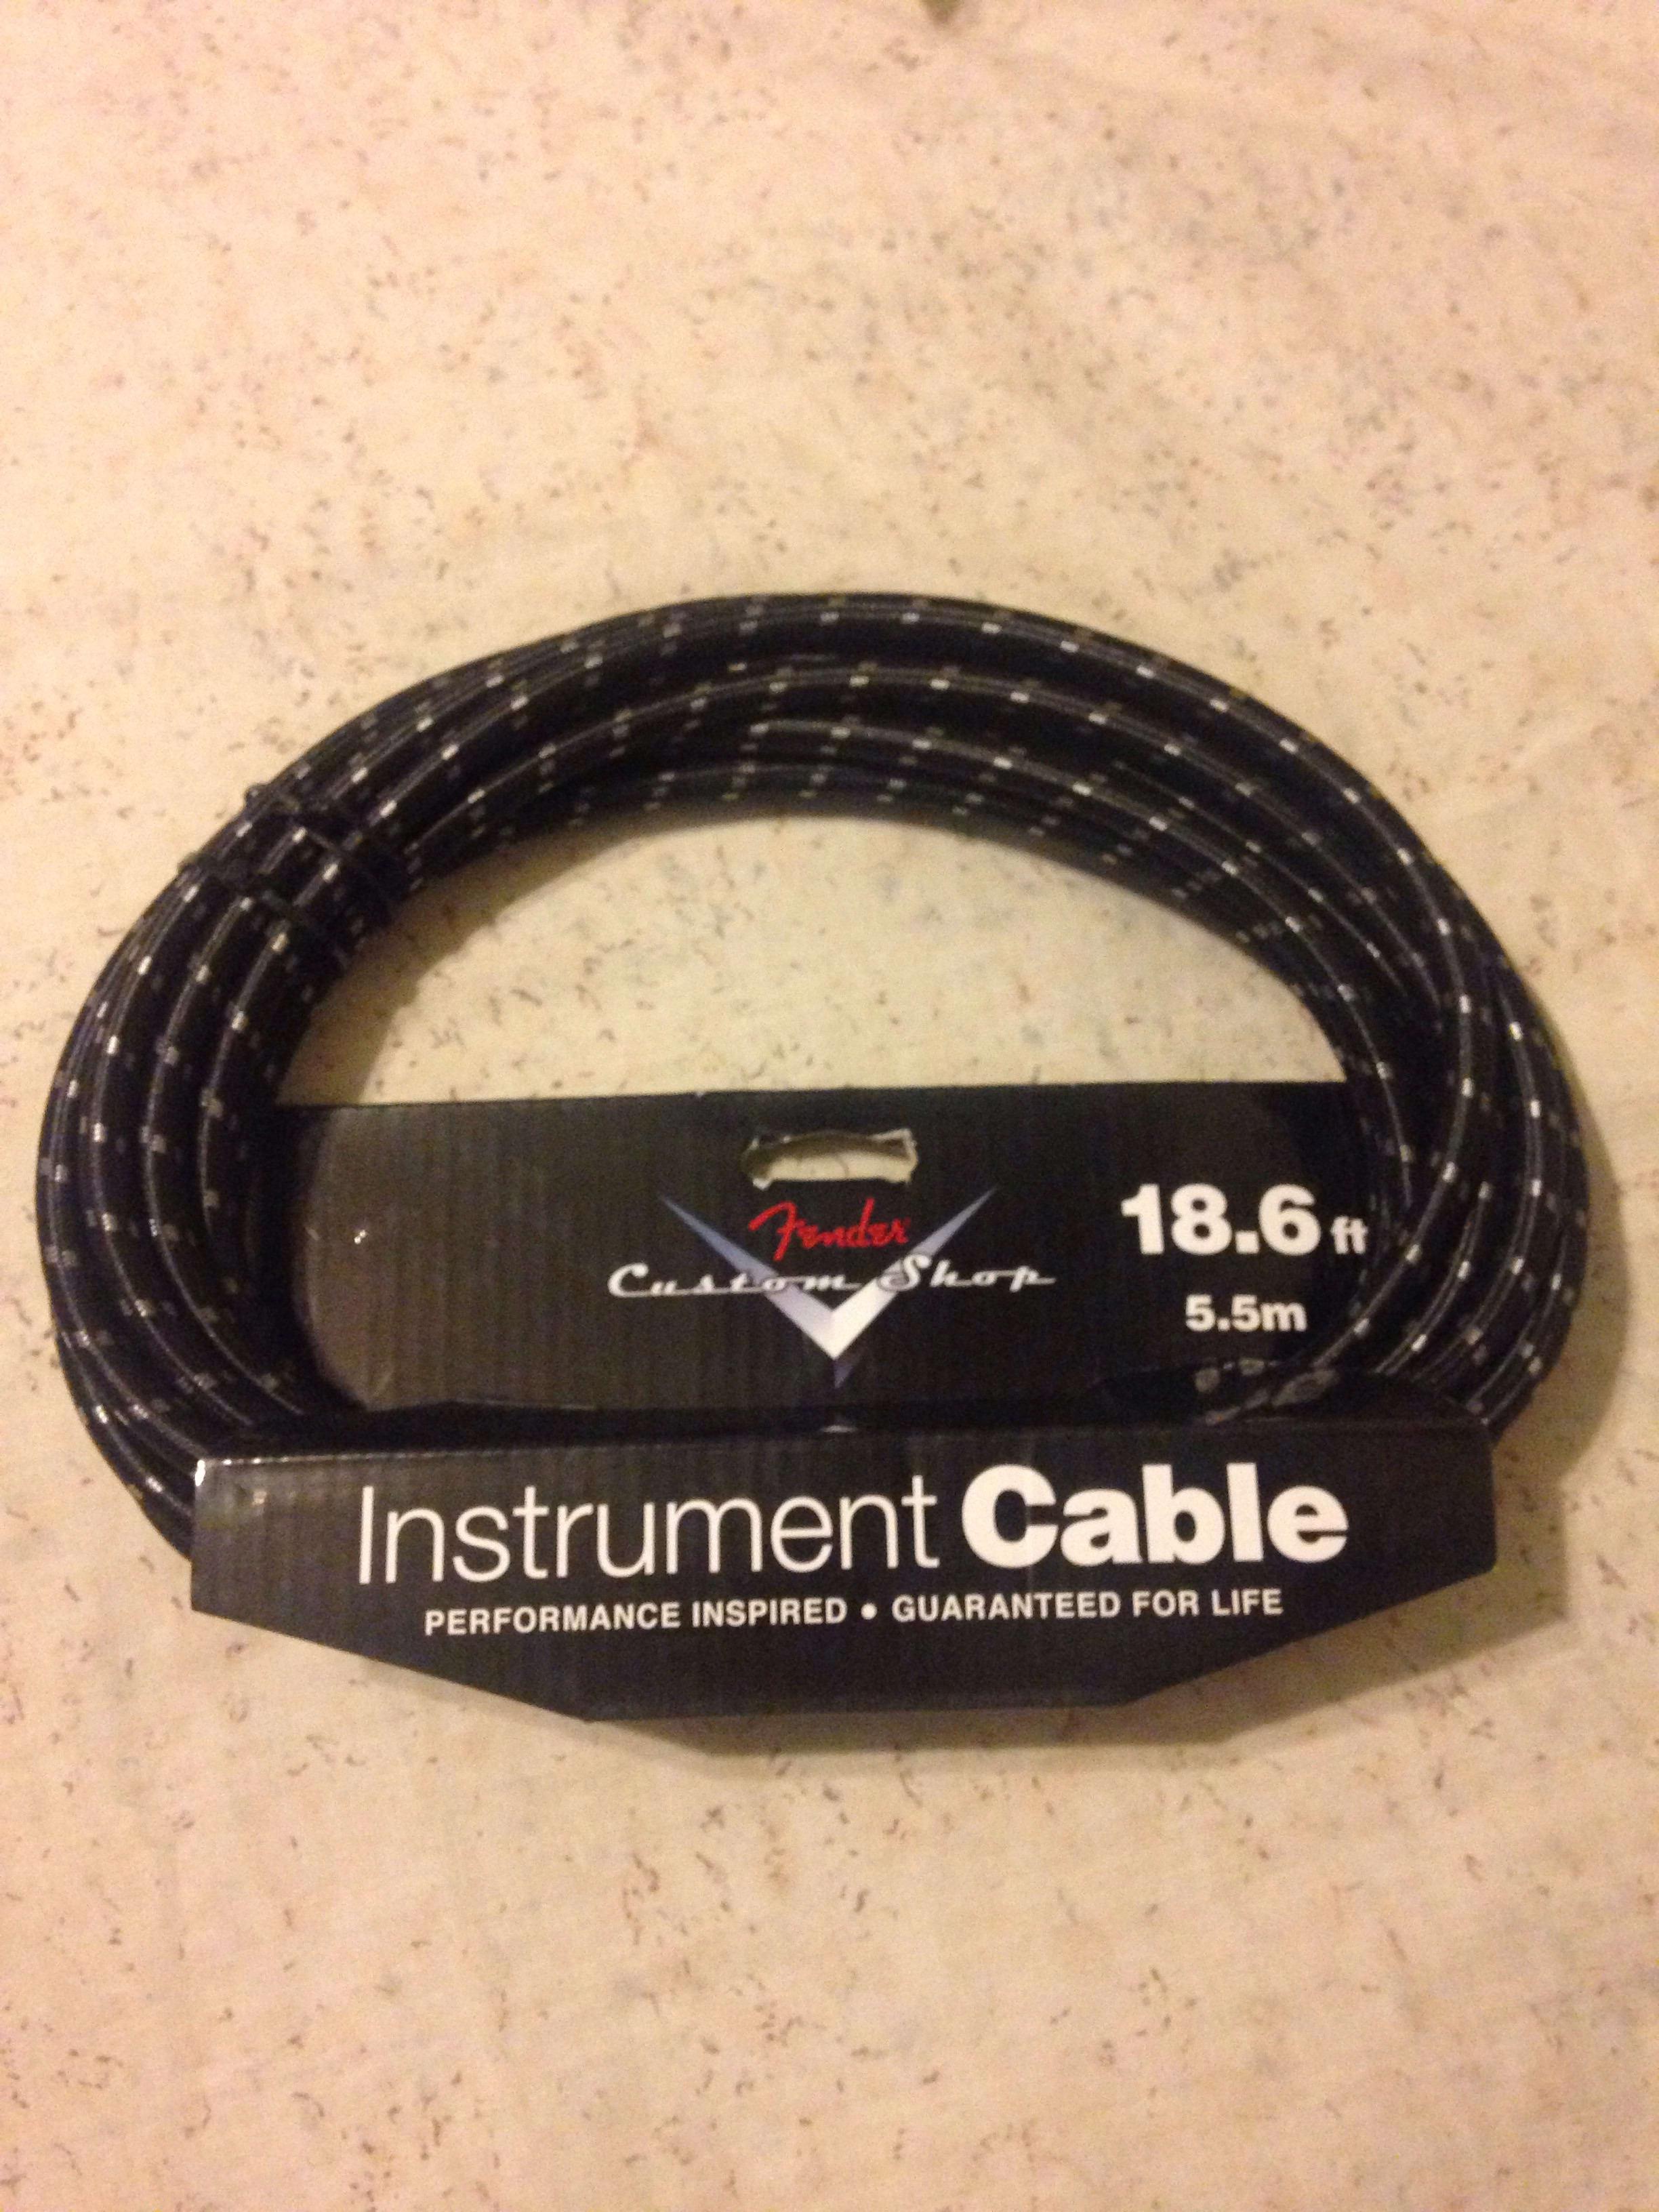 Fender 18.6' fender custom shop instrument cable Black Tweed